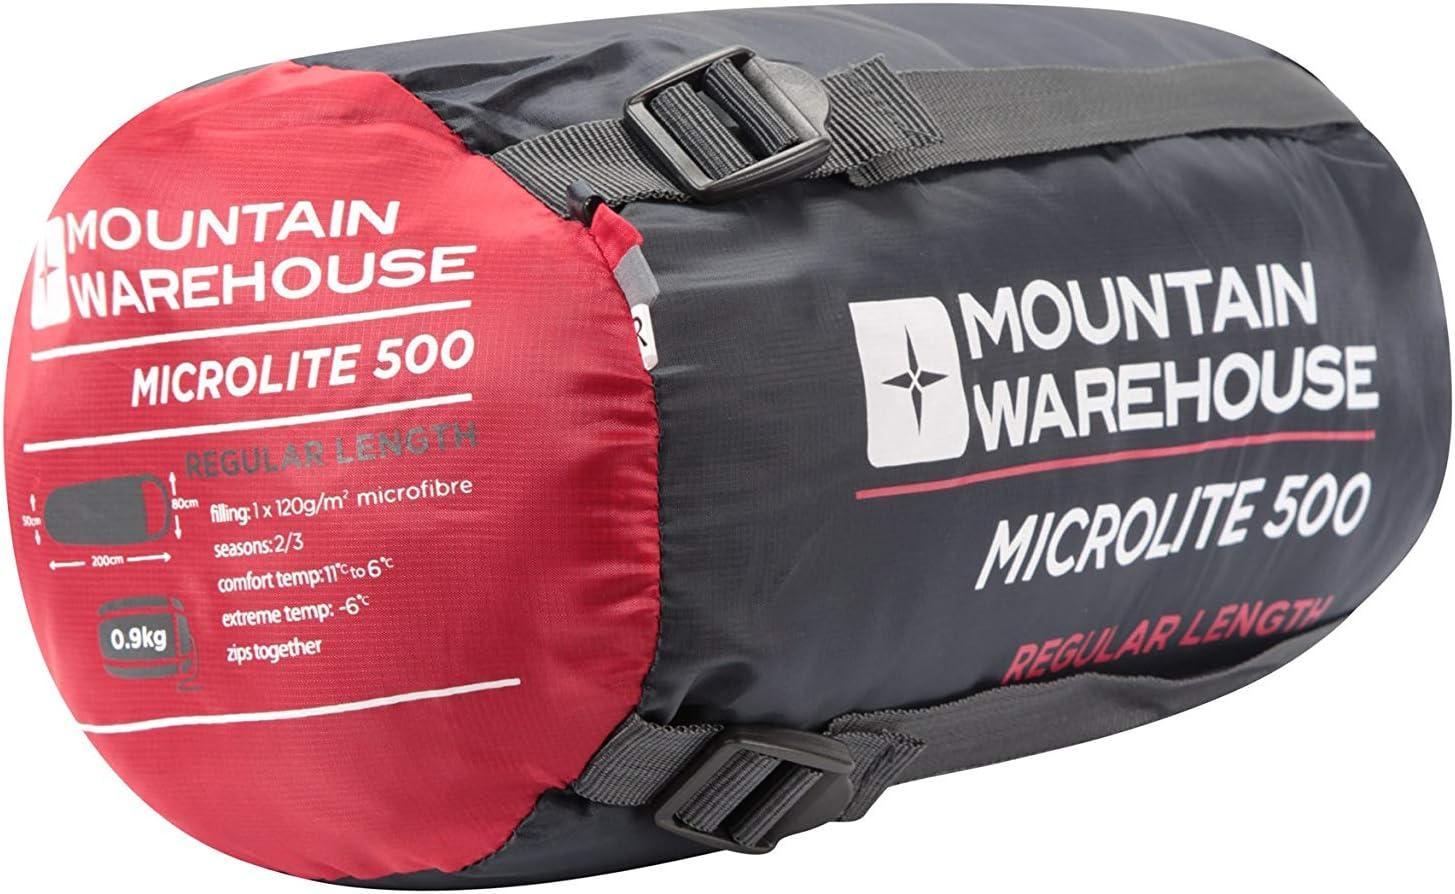 Mountain Warehouse Microlite 500 Sleeping Bag